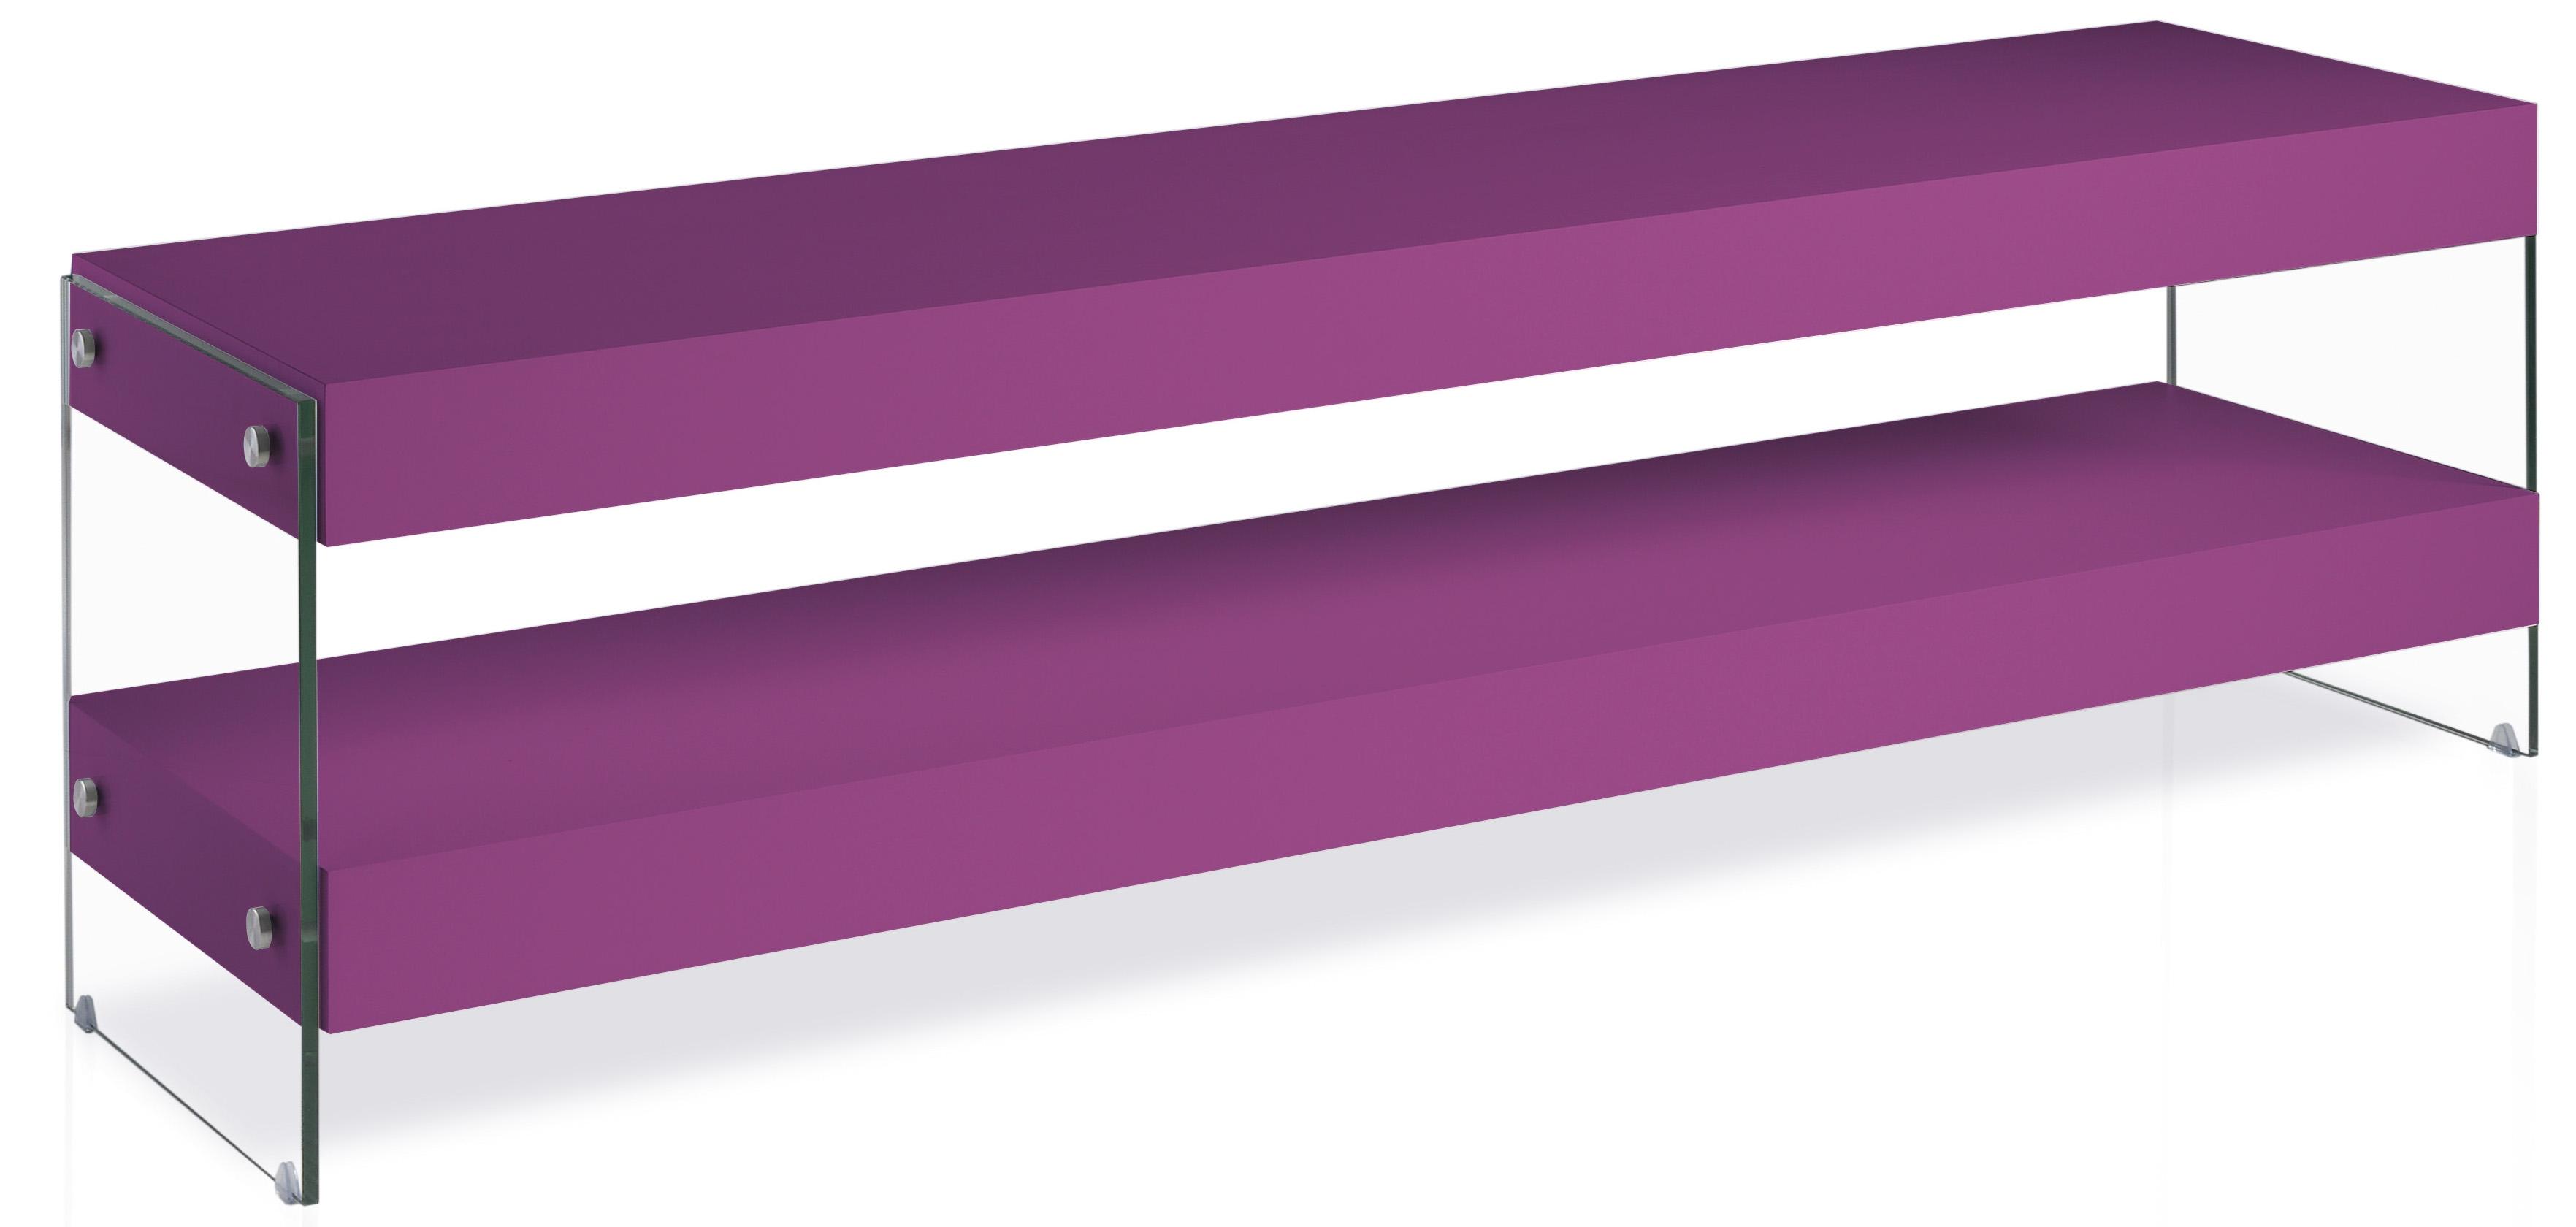 meuble tv laqu violet cubique. Black Bedroom Furniture Sets. Home Design Ideas